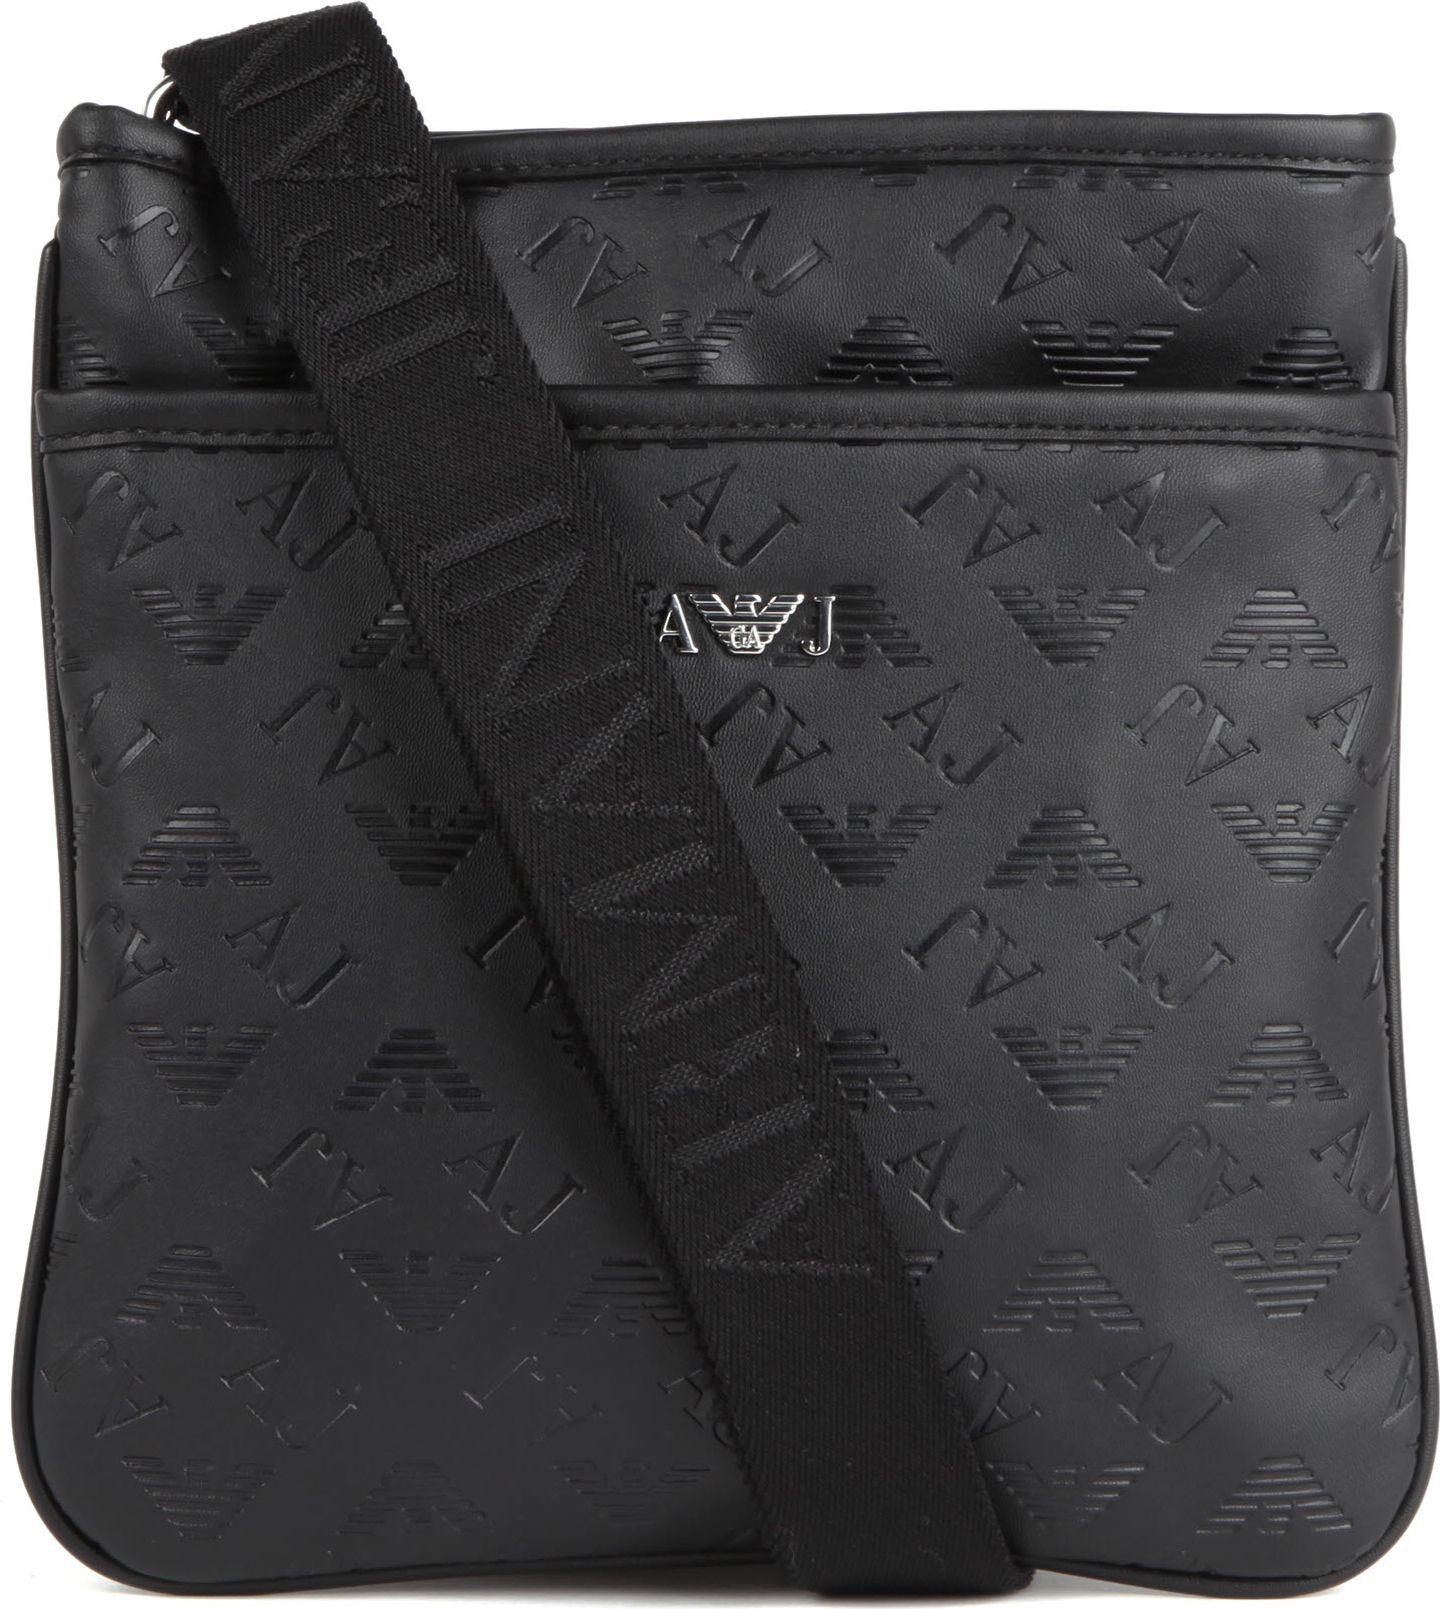 f2ab9362840 Armani Jeans Fauxleather Messenger Bag in Black for Men - Lyst